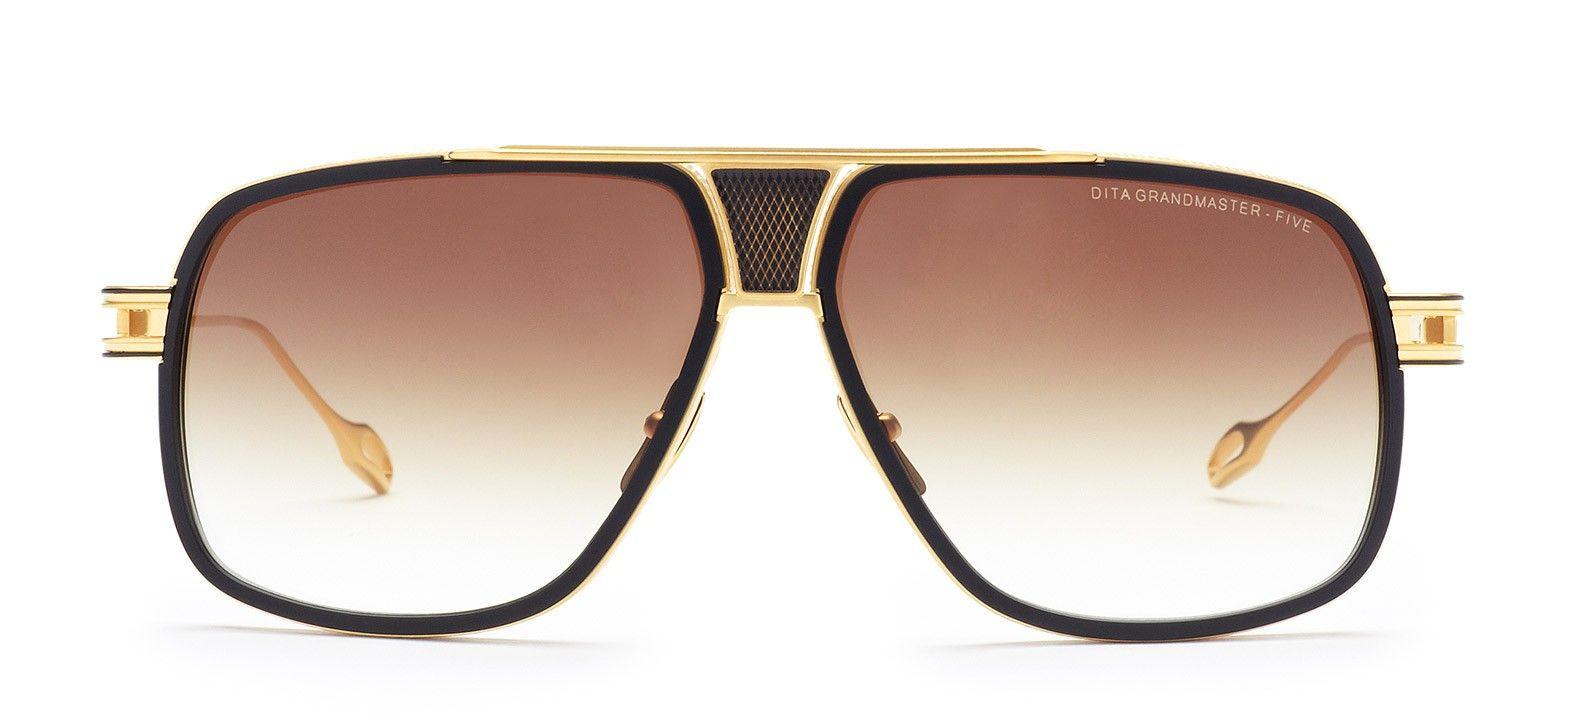 a9a24e0d422 Grandmaster-Five sunglasses from DITA